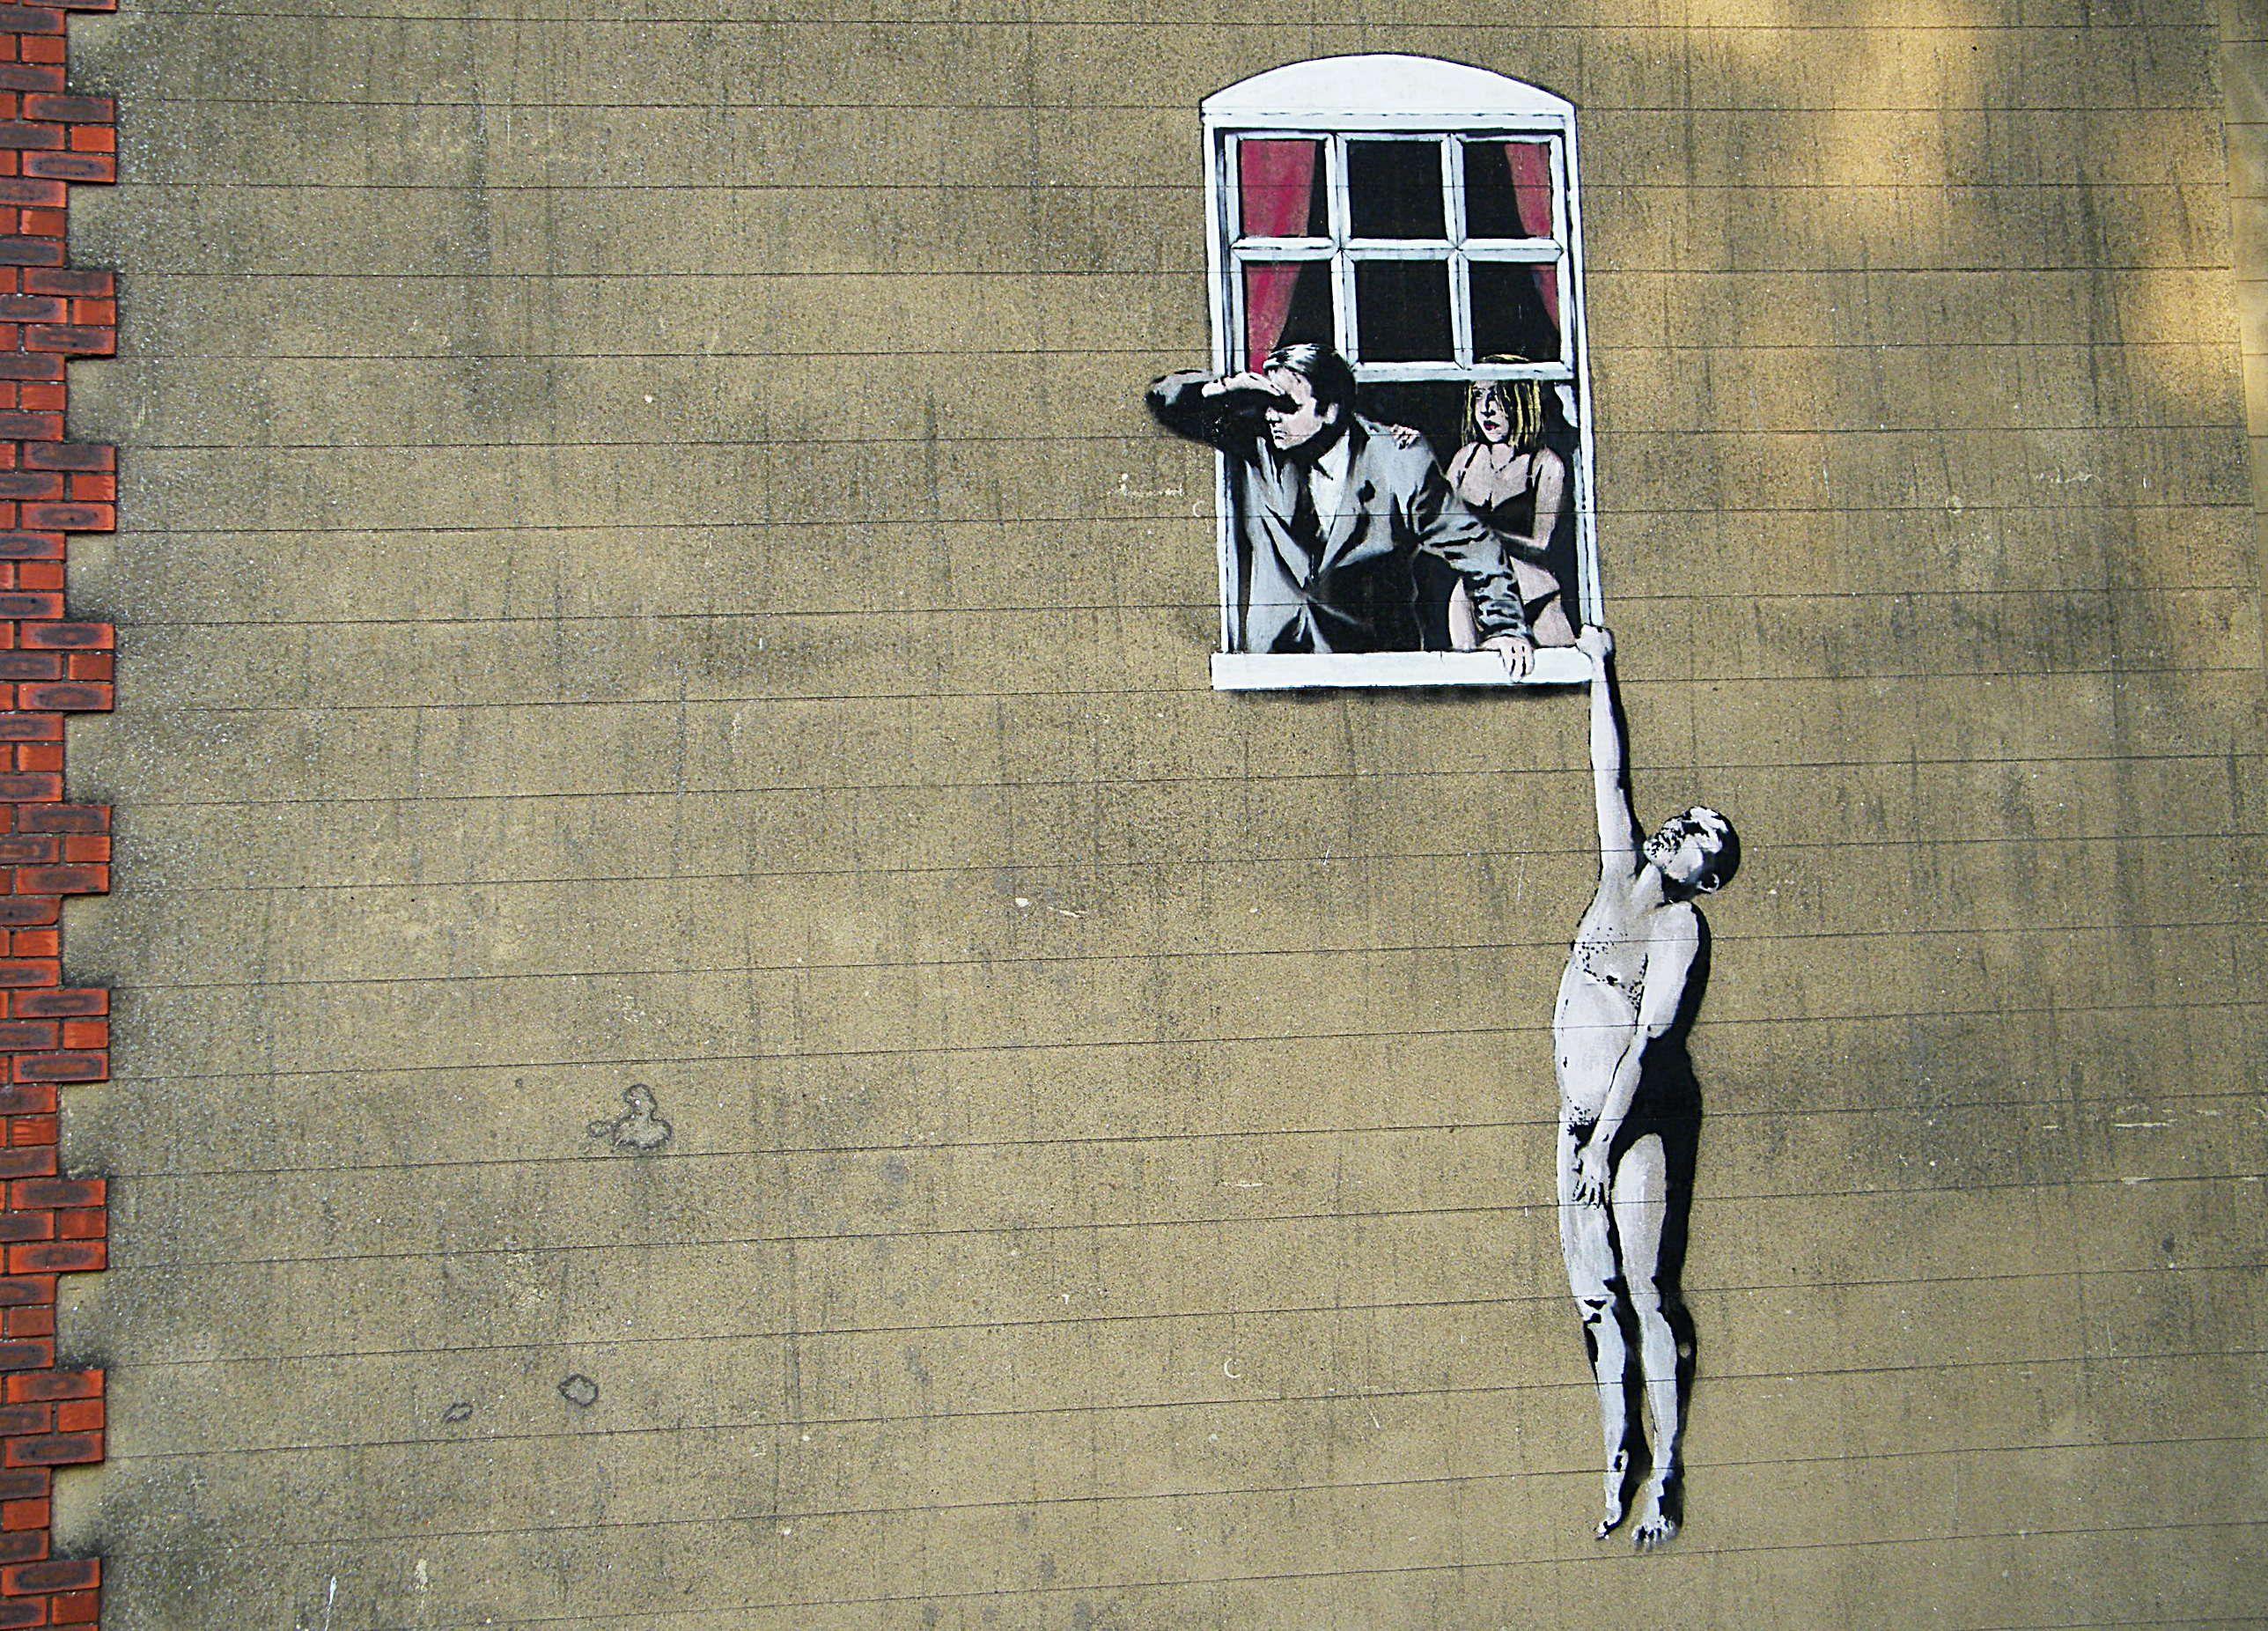 Graffiti art information - Collage